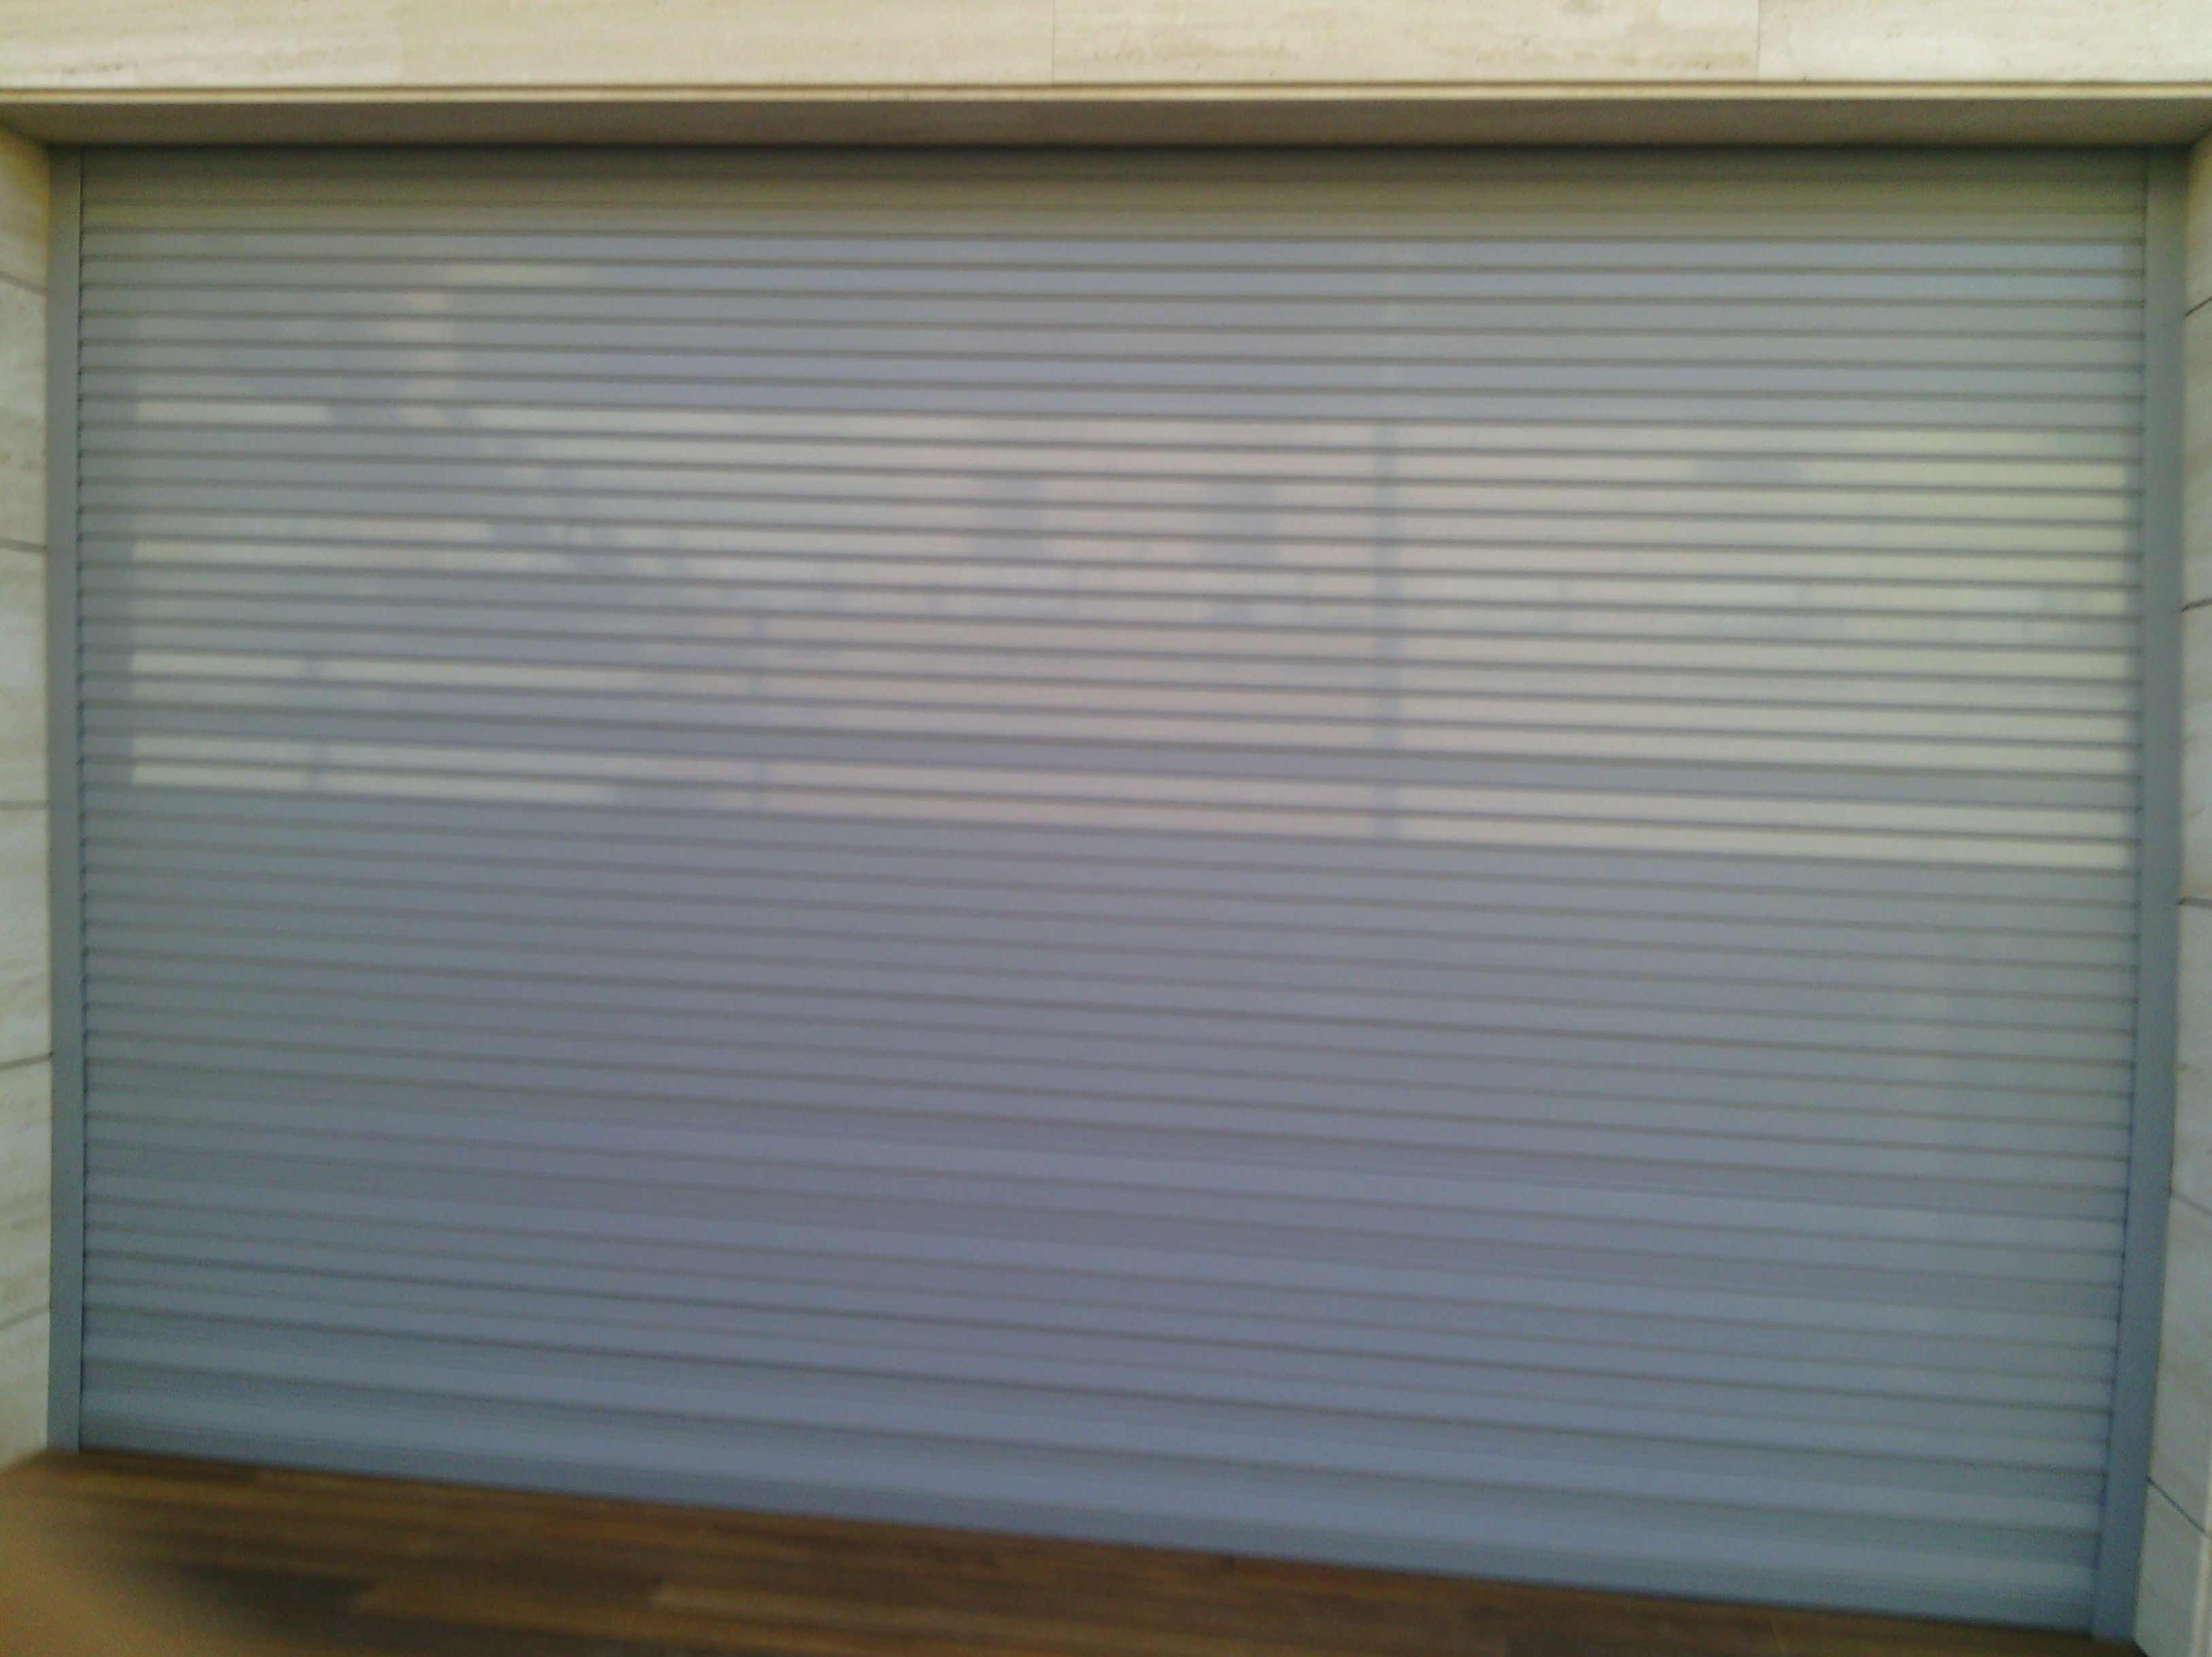 Puerta enrollable de aluminio autoblocante de seguridad